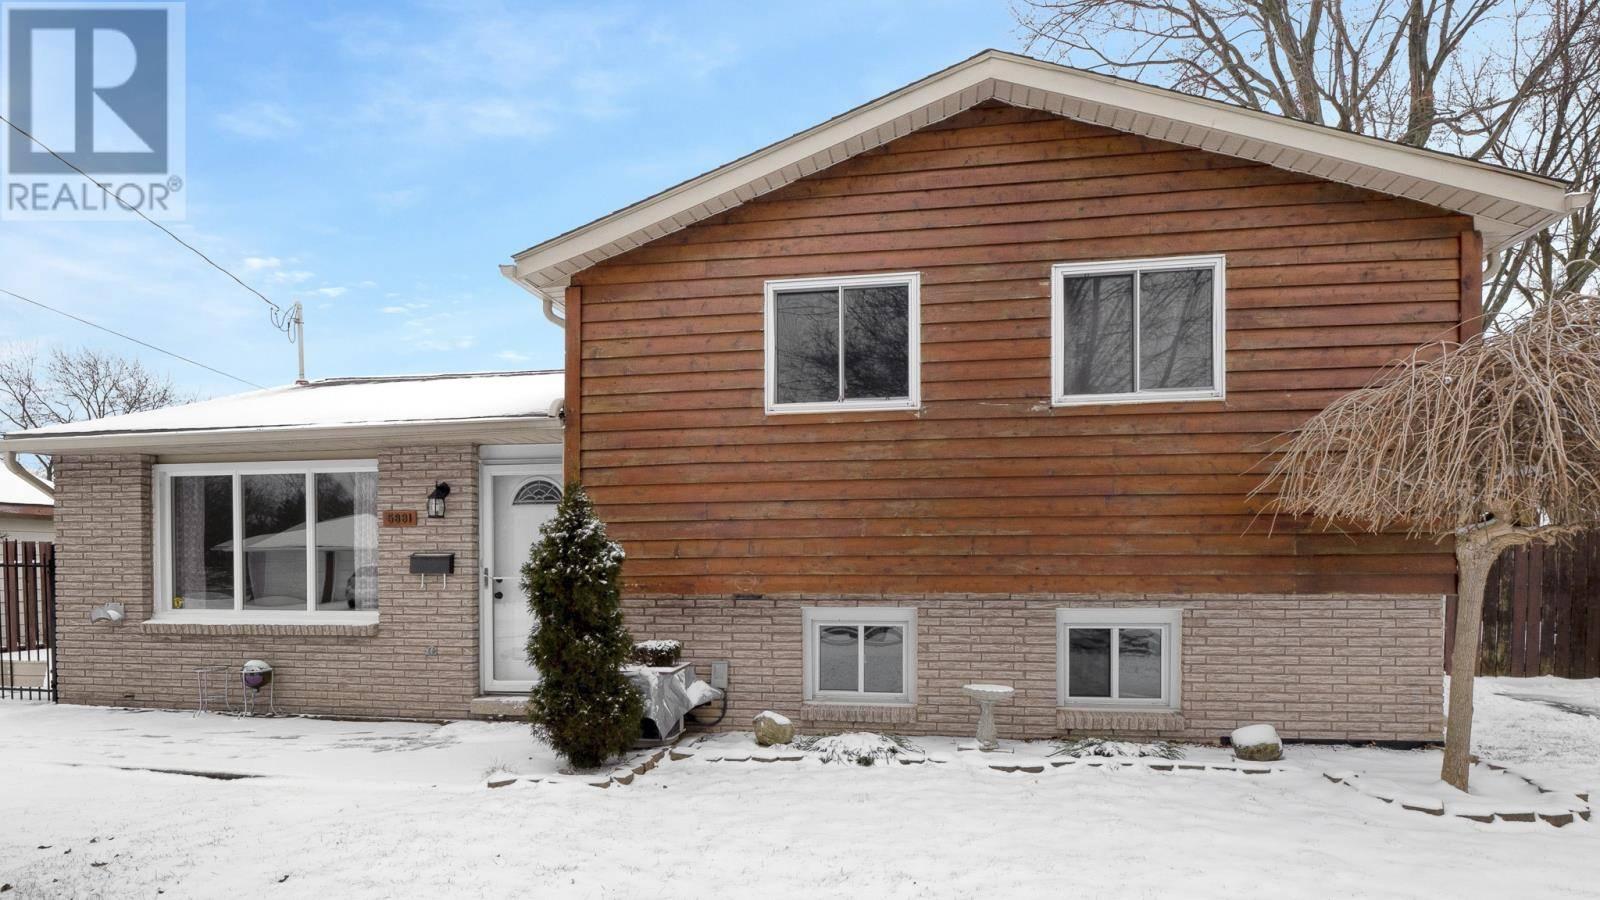 House for sale at 5881 Reginald  Windsor Ontario - MLS: 20001945